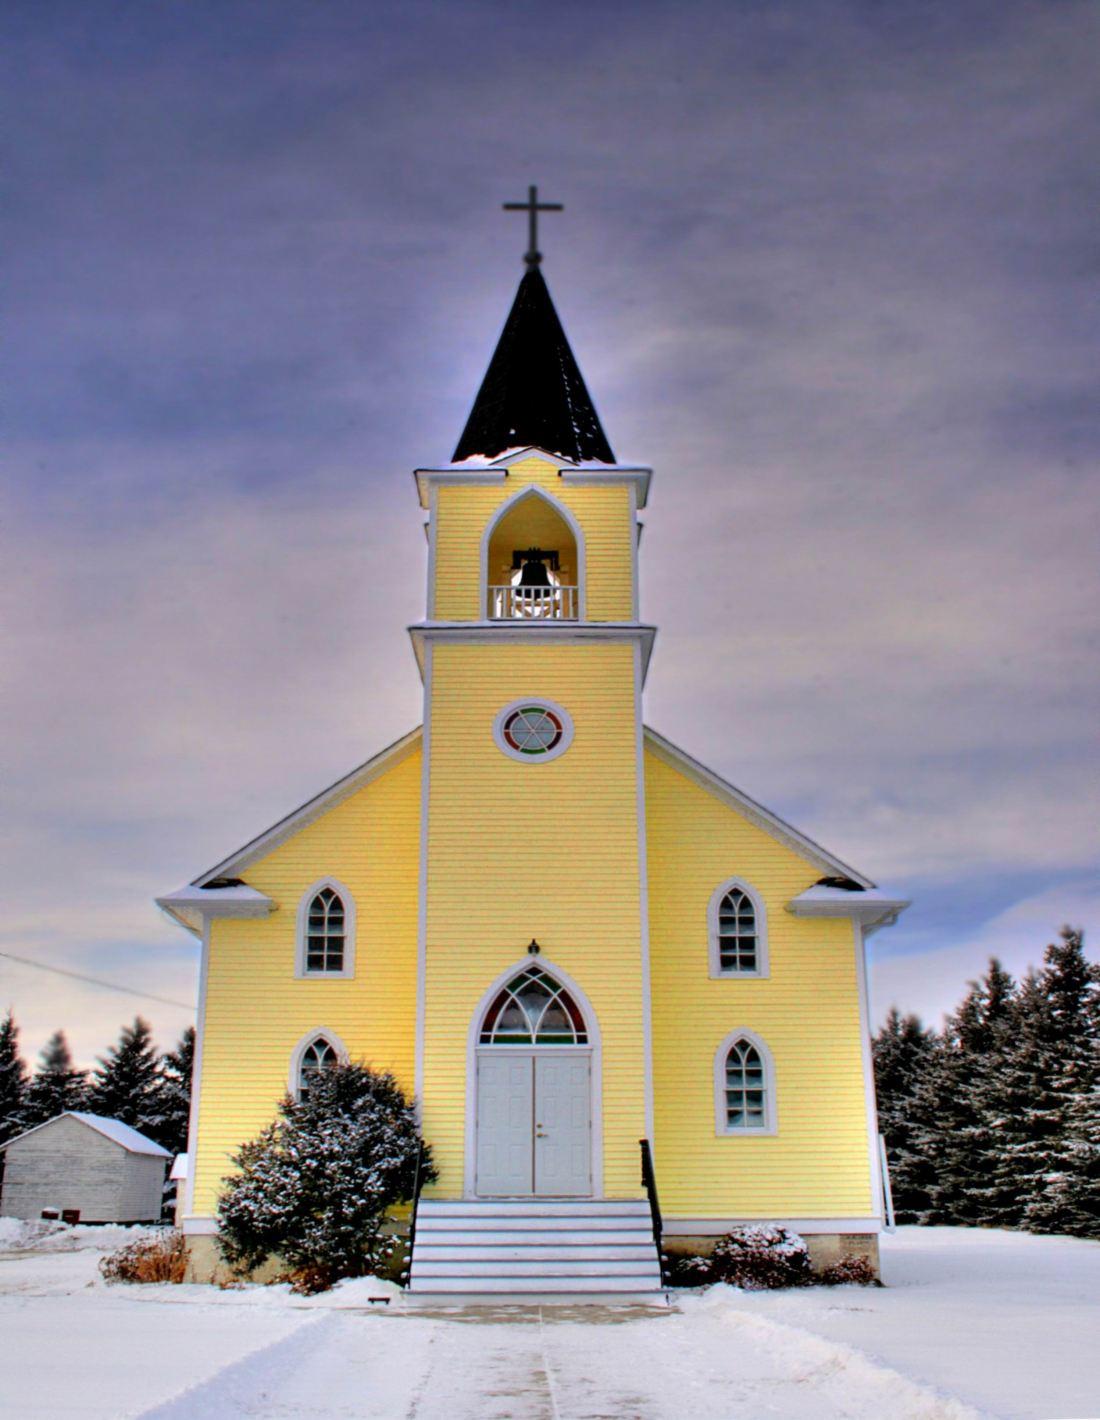 YELLOW LUTH. CHURCH. (Wikiped)  St_Johns_Lutheran_Church_Rabbit_Hill_Alberta_Canada_02A - WIDENED